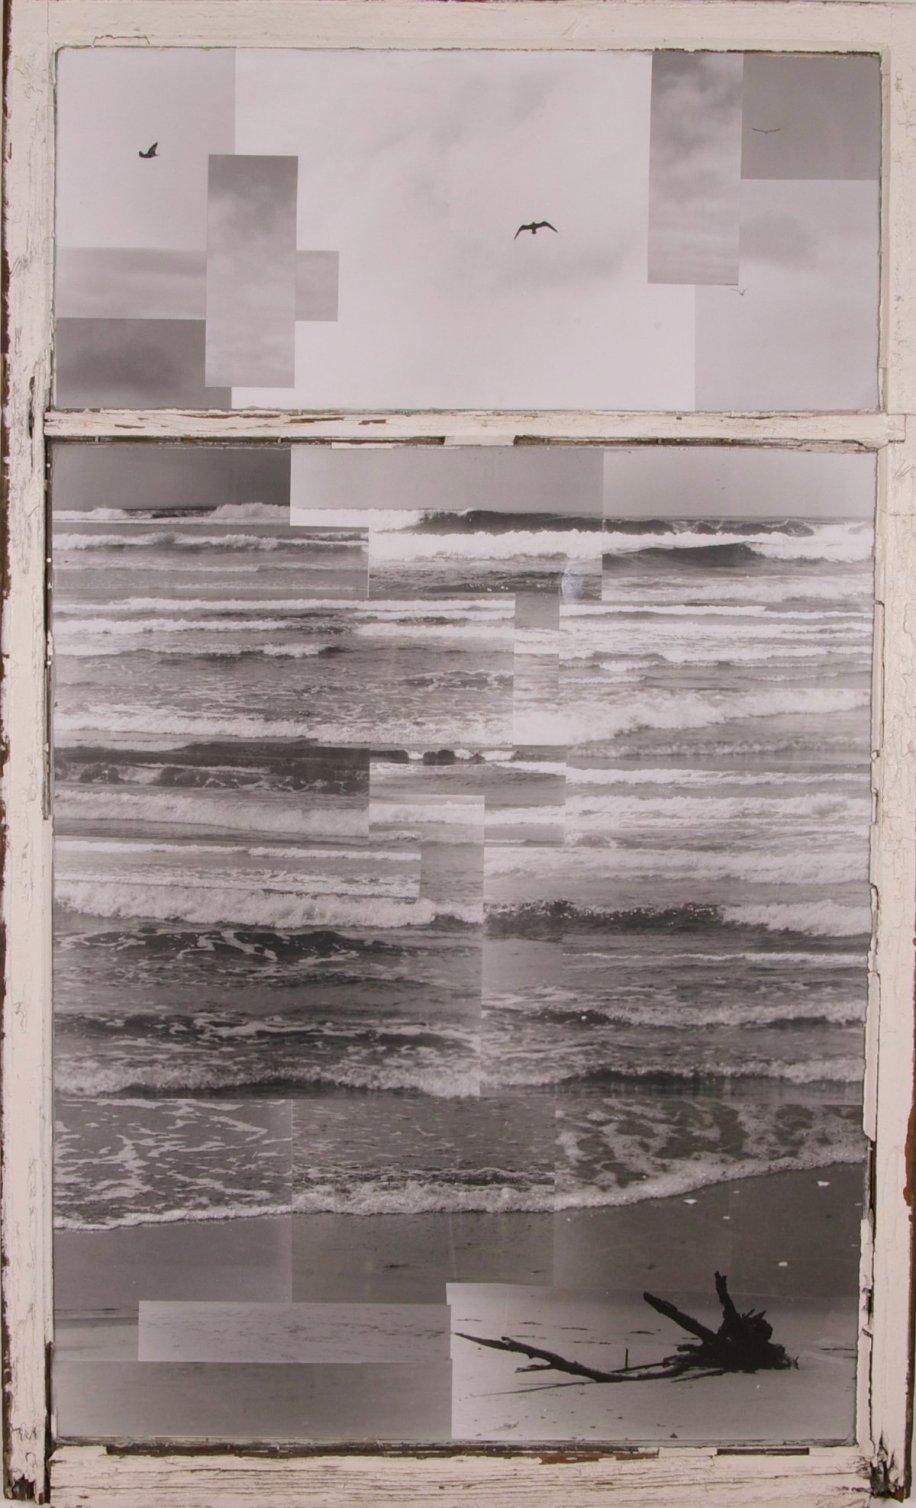 Johnathan Livingston Seagull 4 ft x 6 ft SOLD